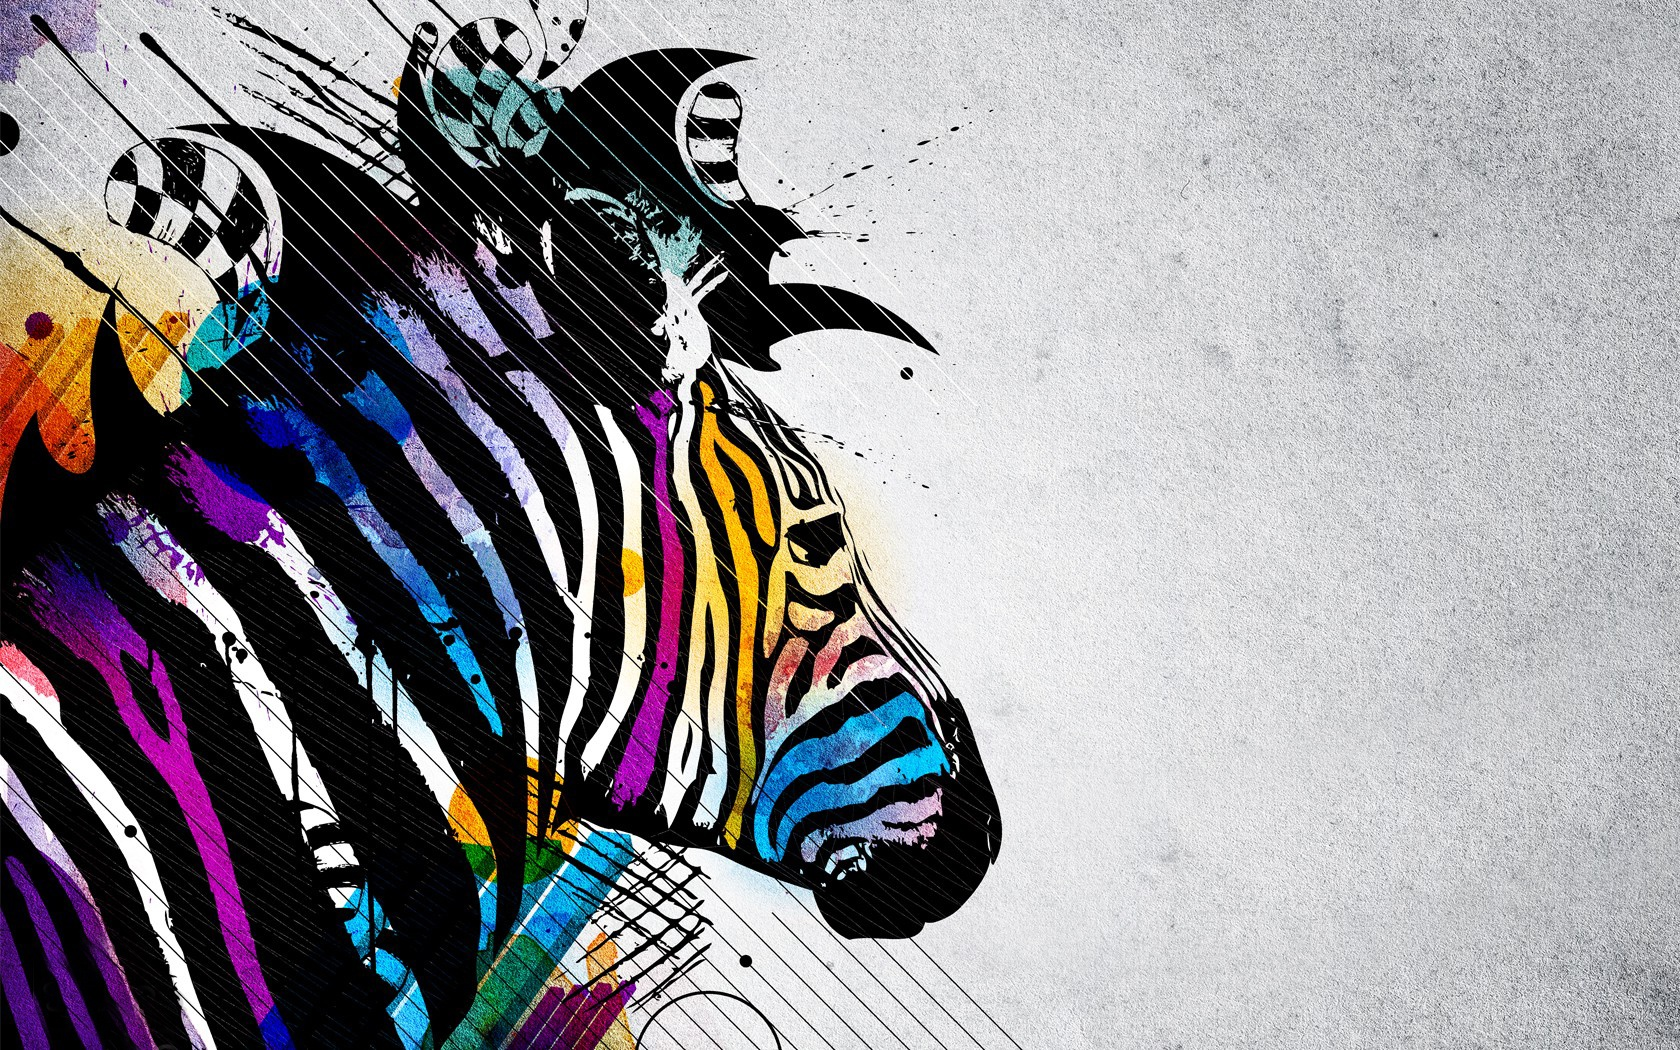 zebra soap opera and summer art